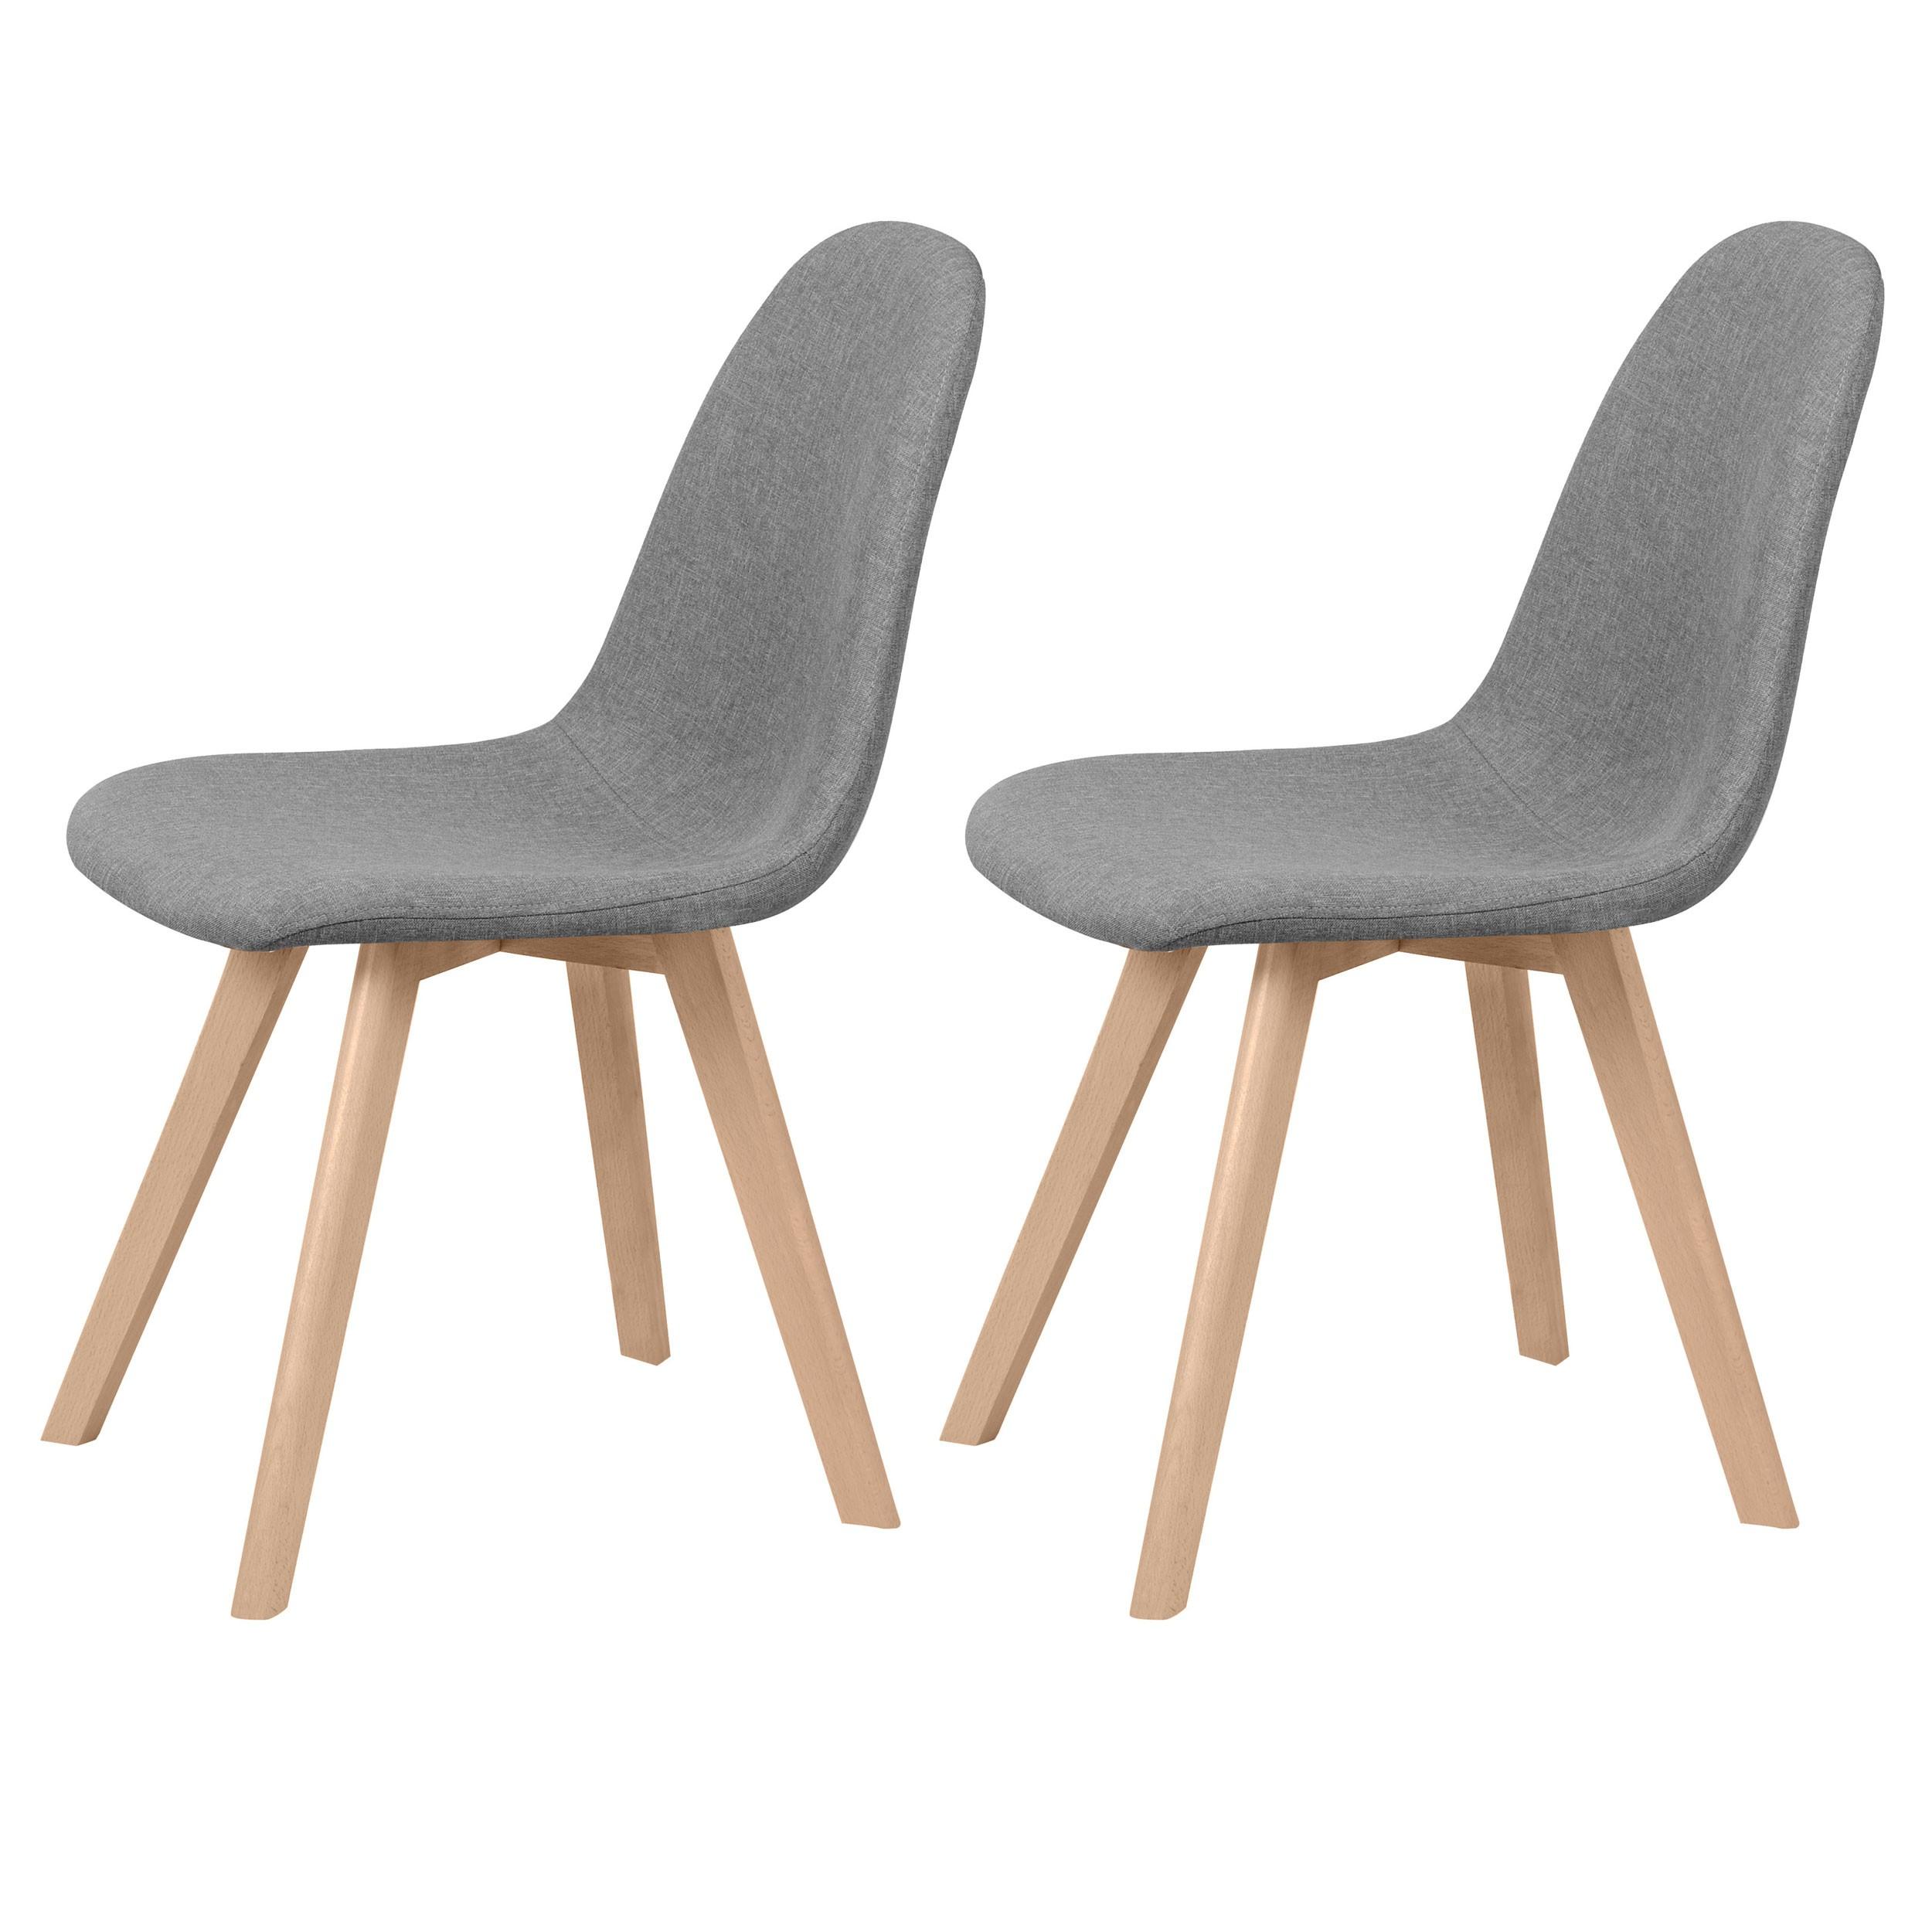 acheter chaises grises scandinaves - Chaise Grise Scandinave